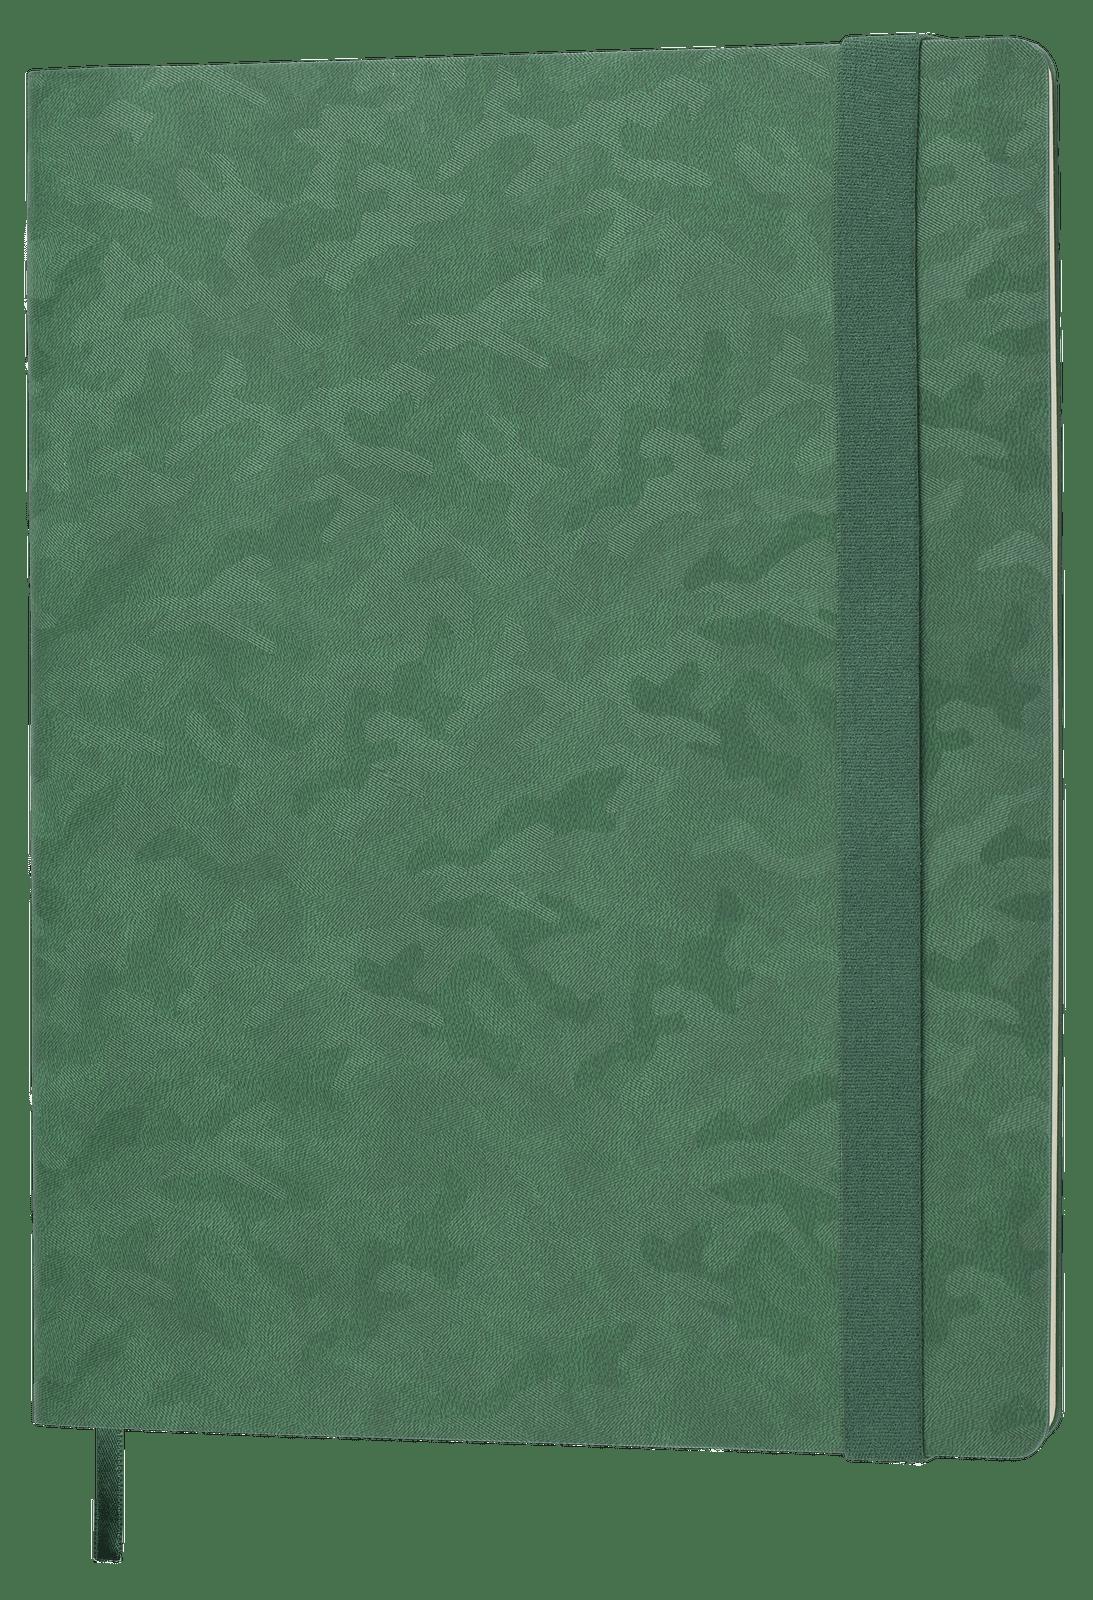 TM21228_15 - Tabby Biggy verde